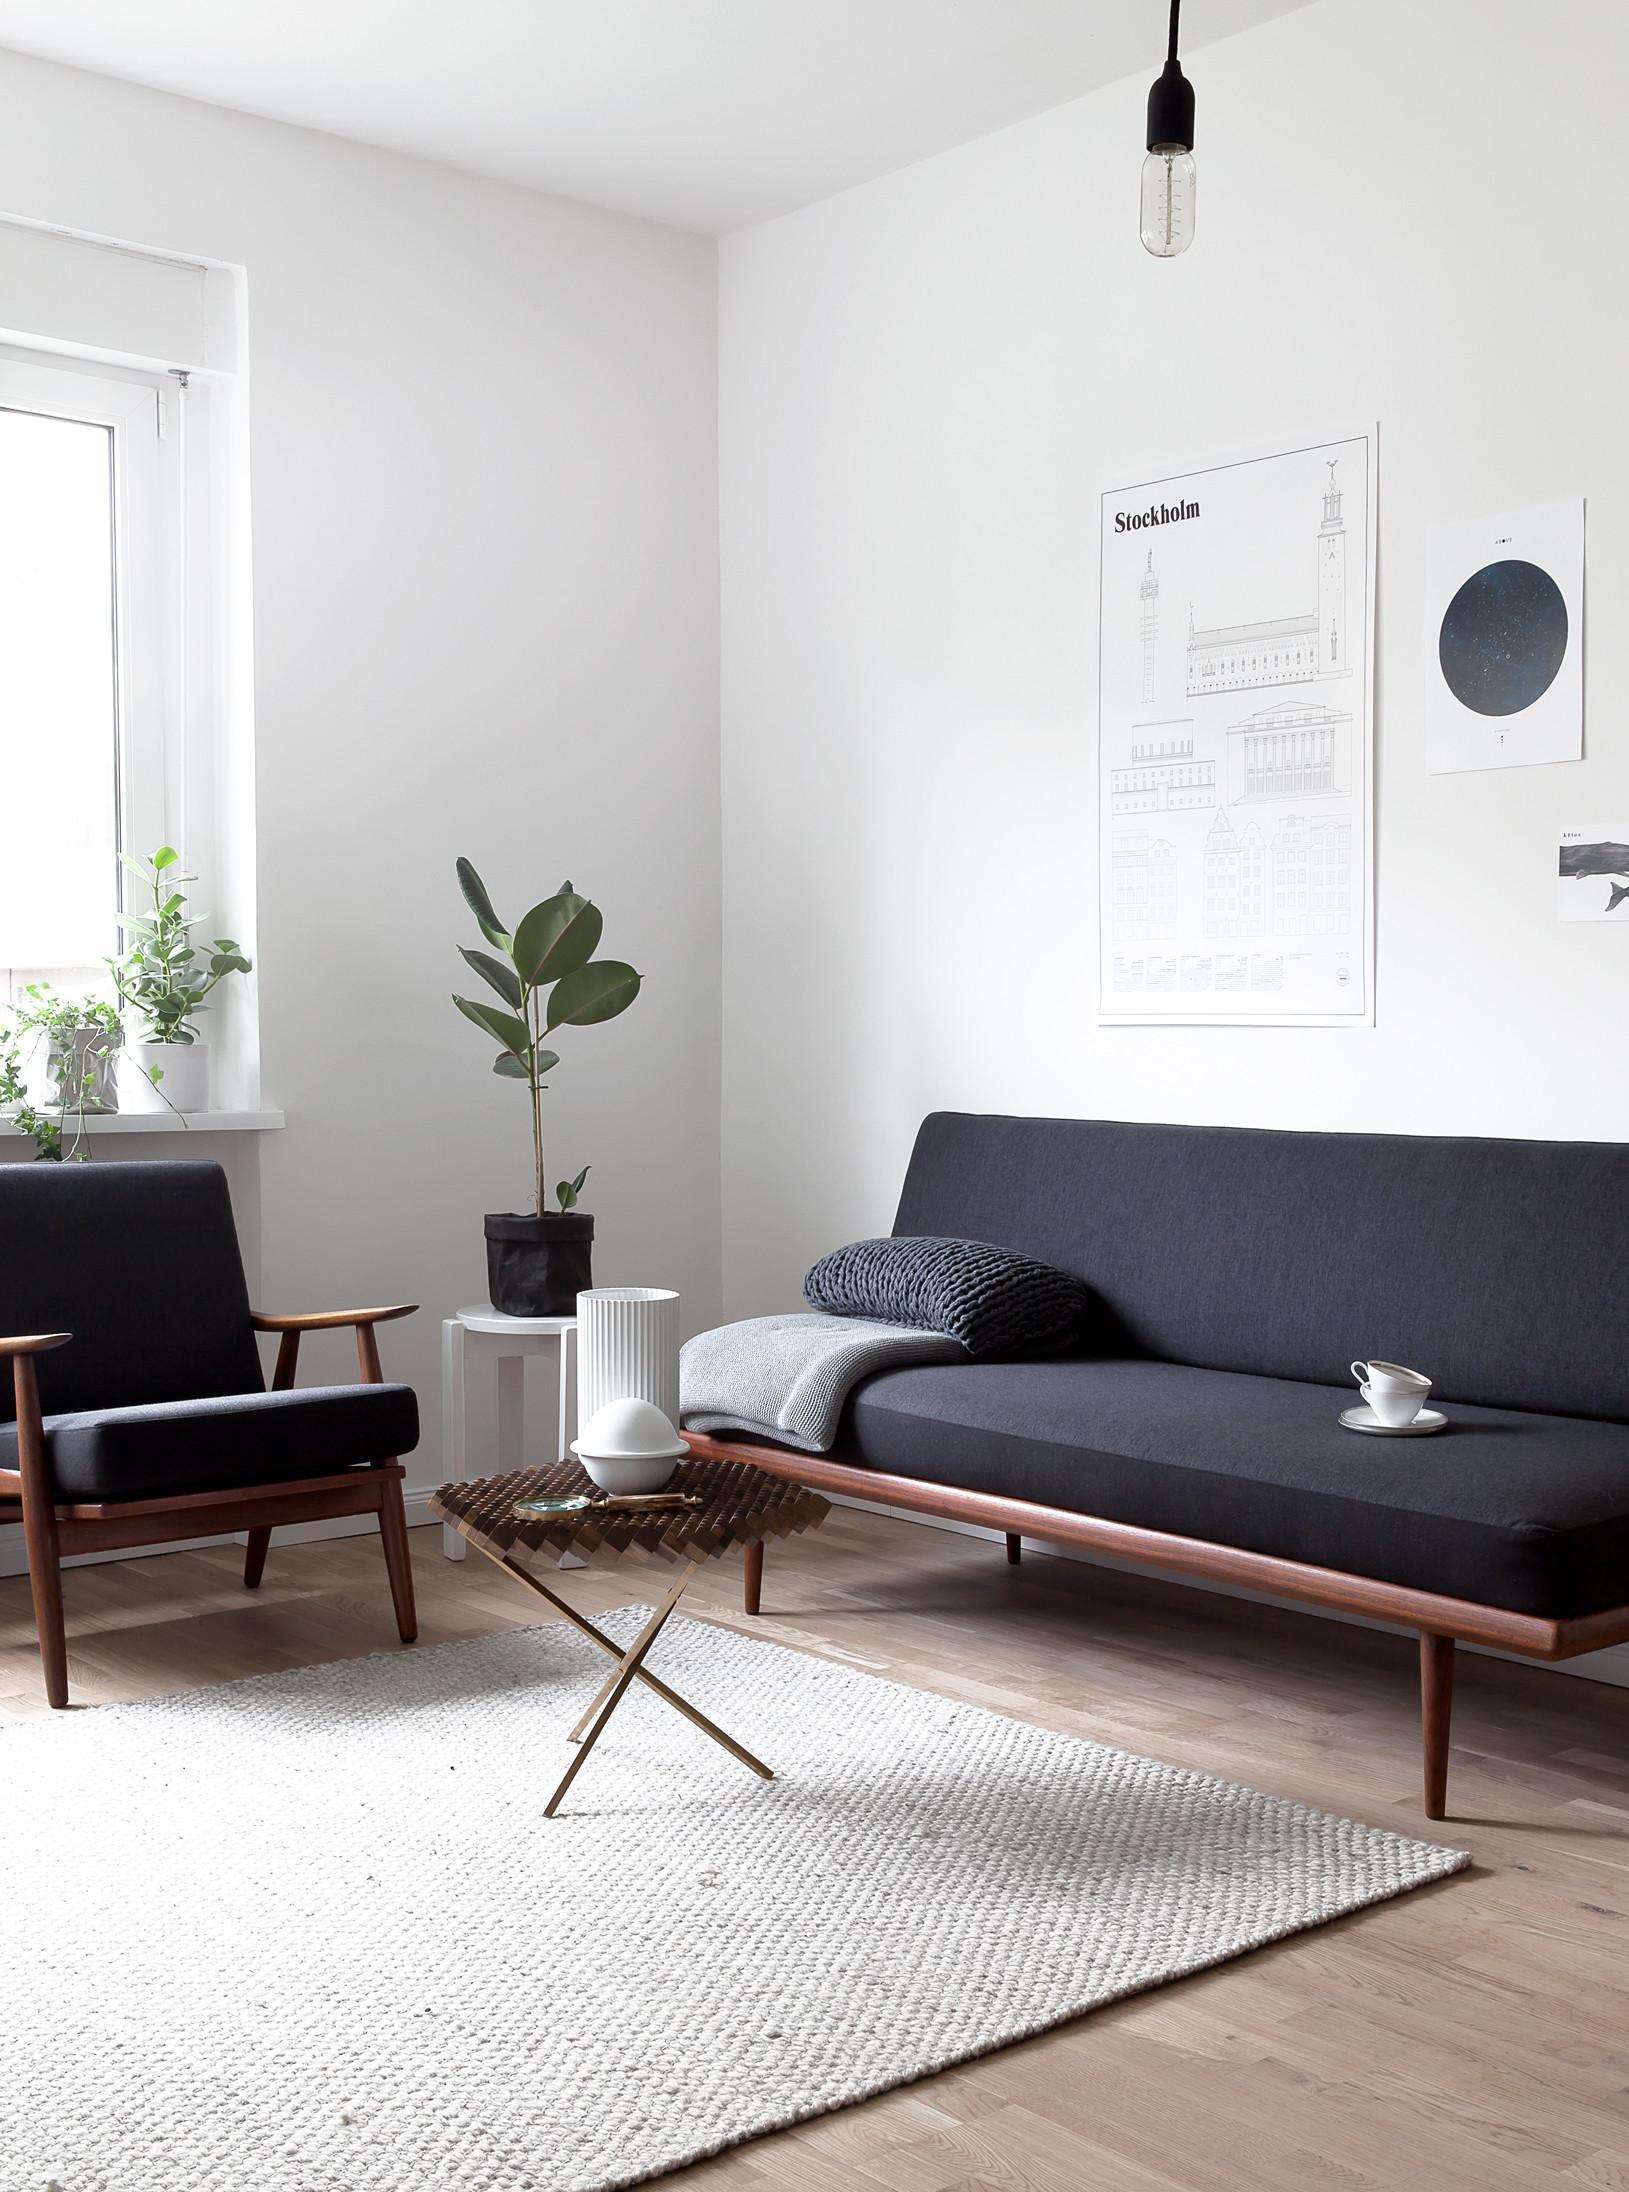 Minimalismo caracter sticas do estilo e inspira es - Mobiliario minimalista ...